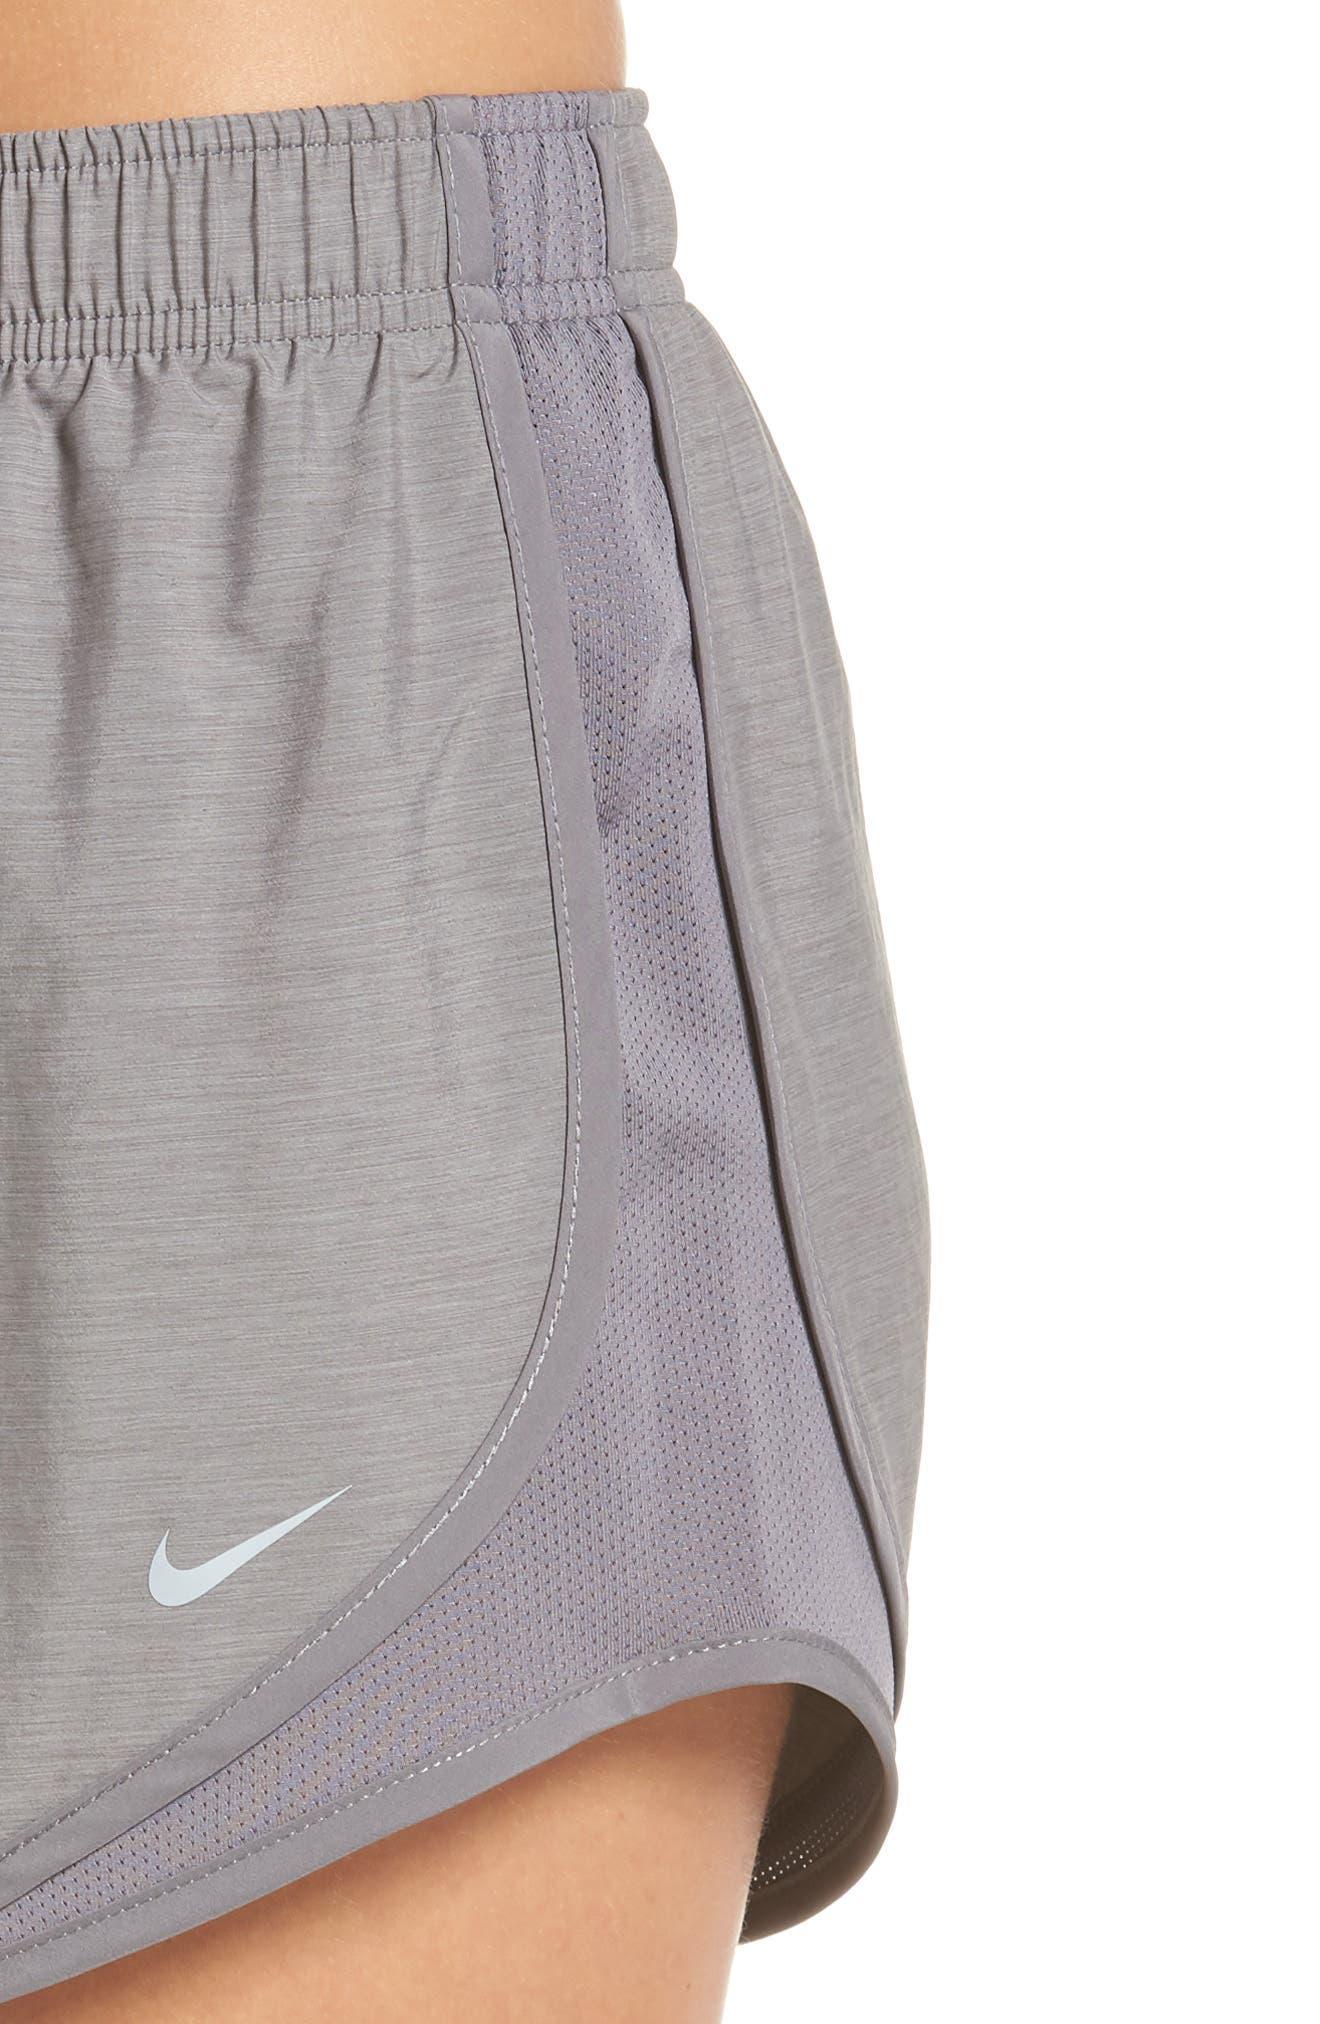 NIKE, Dry Tempo Running Shorts, Alternate thumbnail 5, color, GUNSMOKE/ WOLF GREY